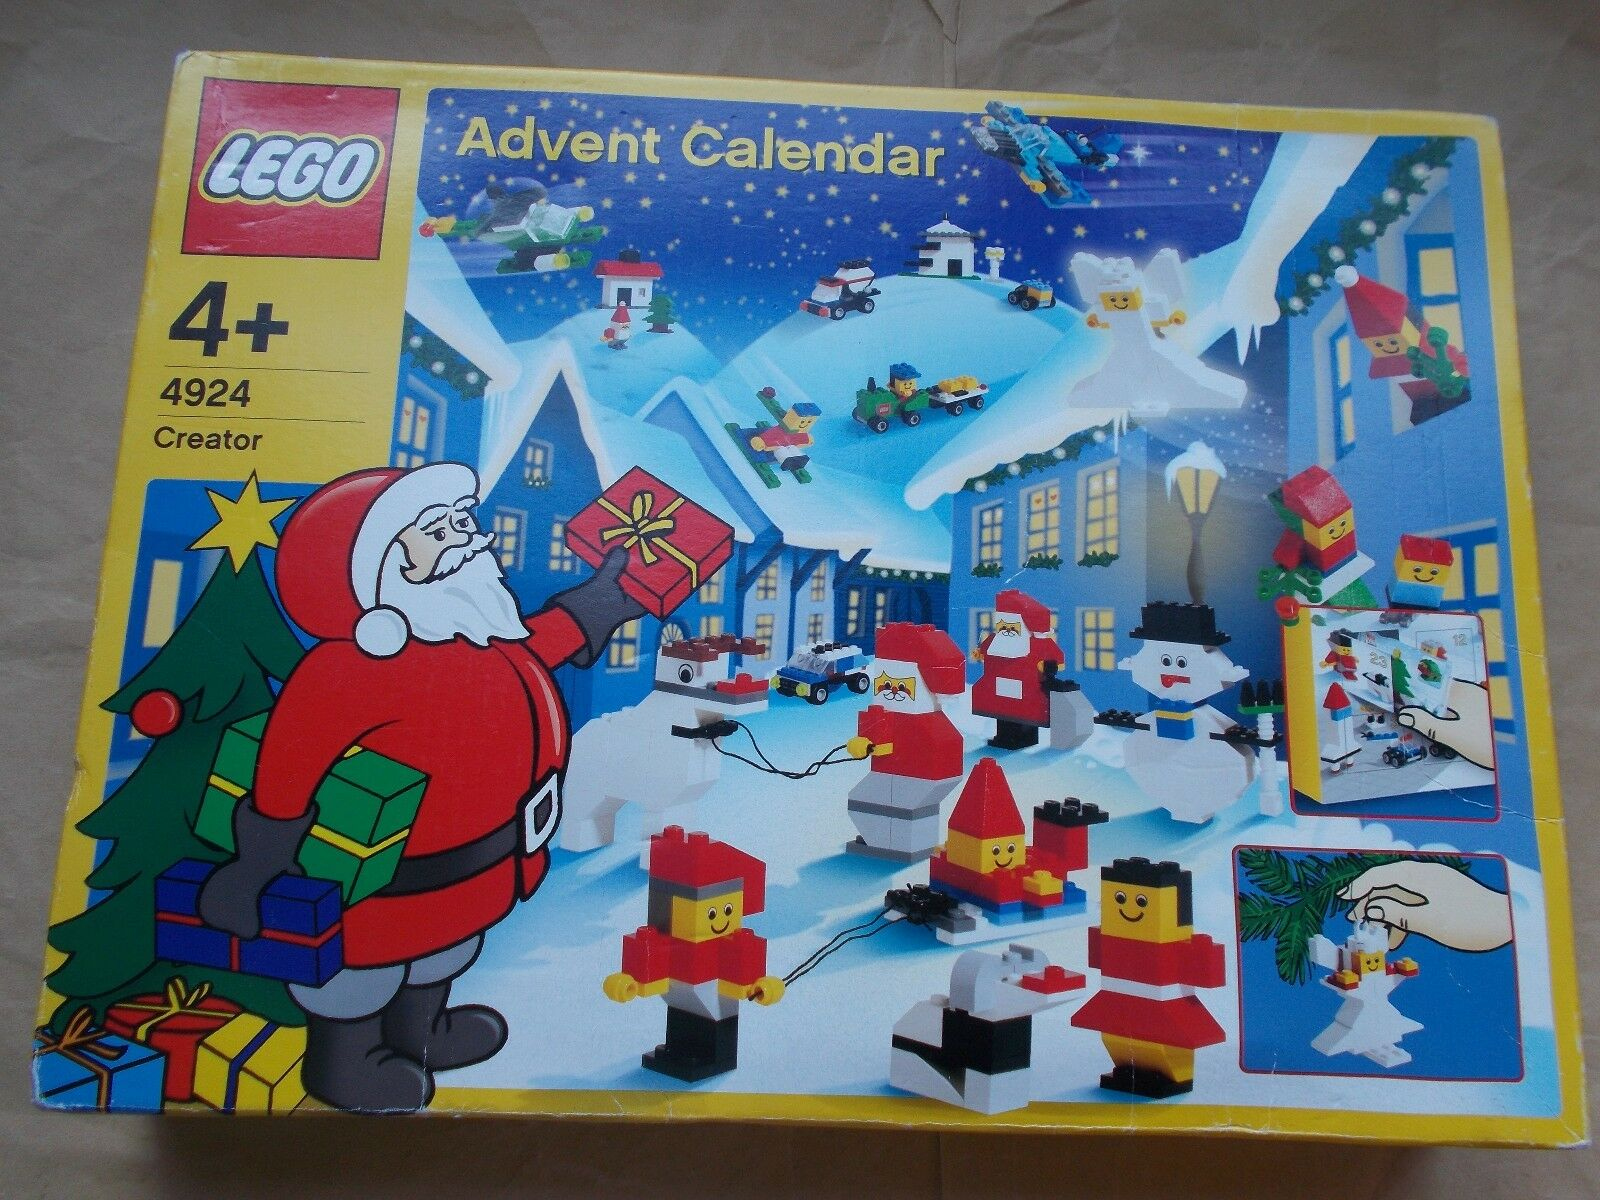 LEGO ADVENT CALENDAR SET  4924 Box Build 24 models 4 Tree Decorations or 4 SCENES  le style classique